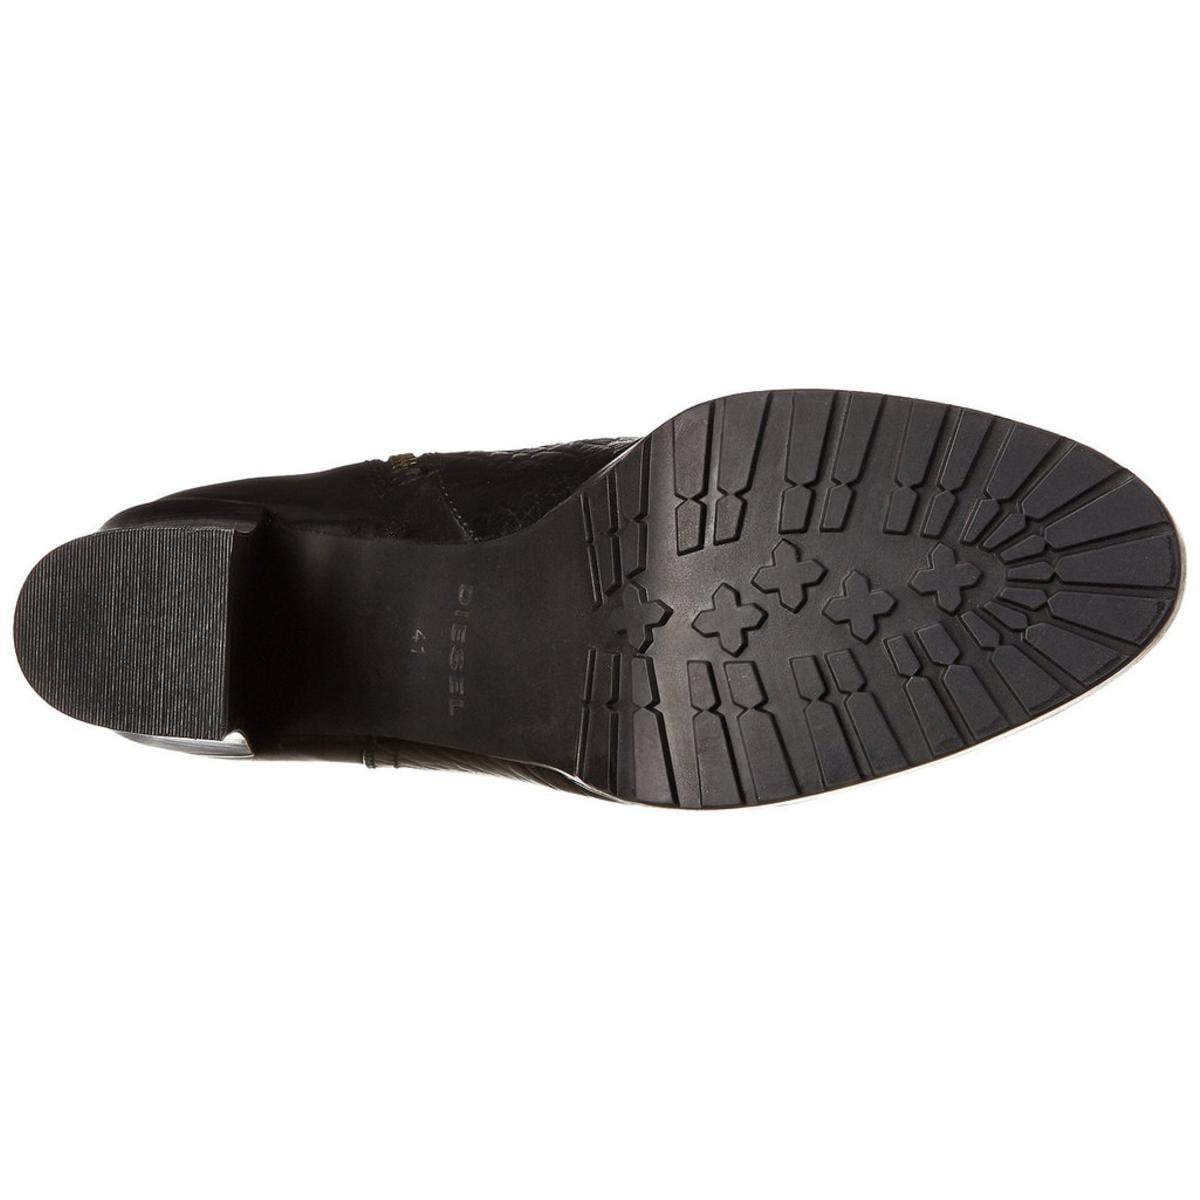 Diesel Women's Bora Black/Black Boot 7.5M